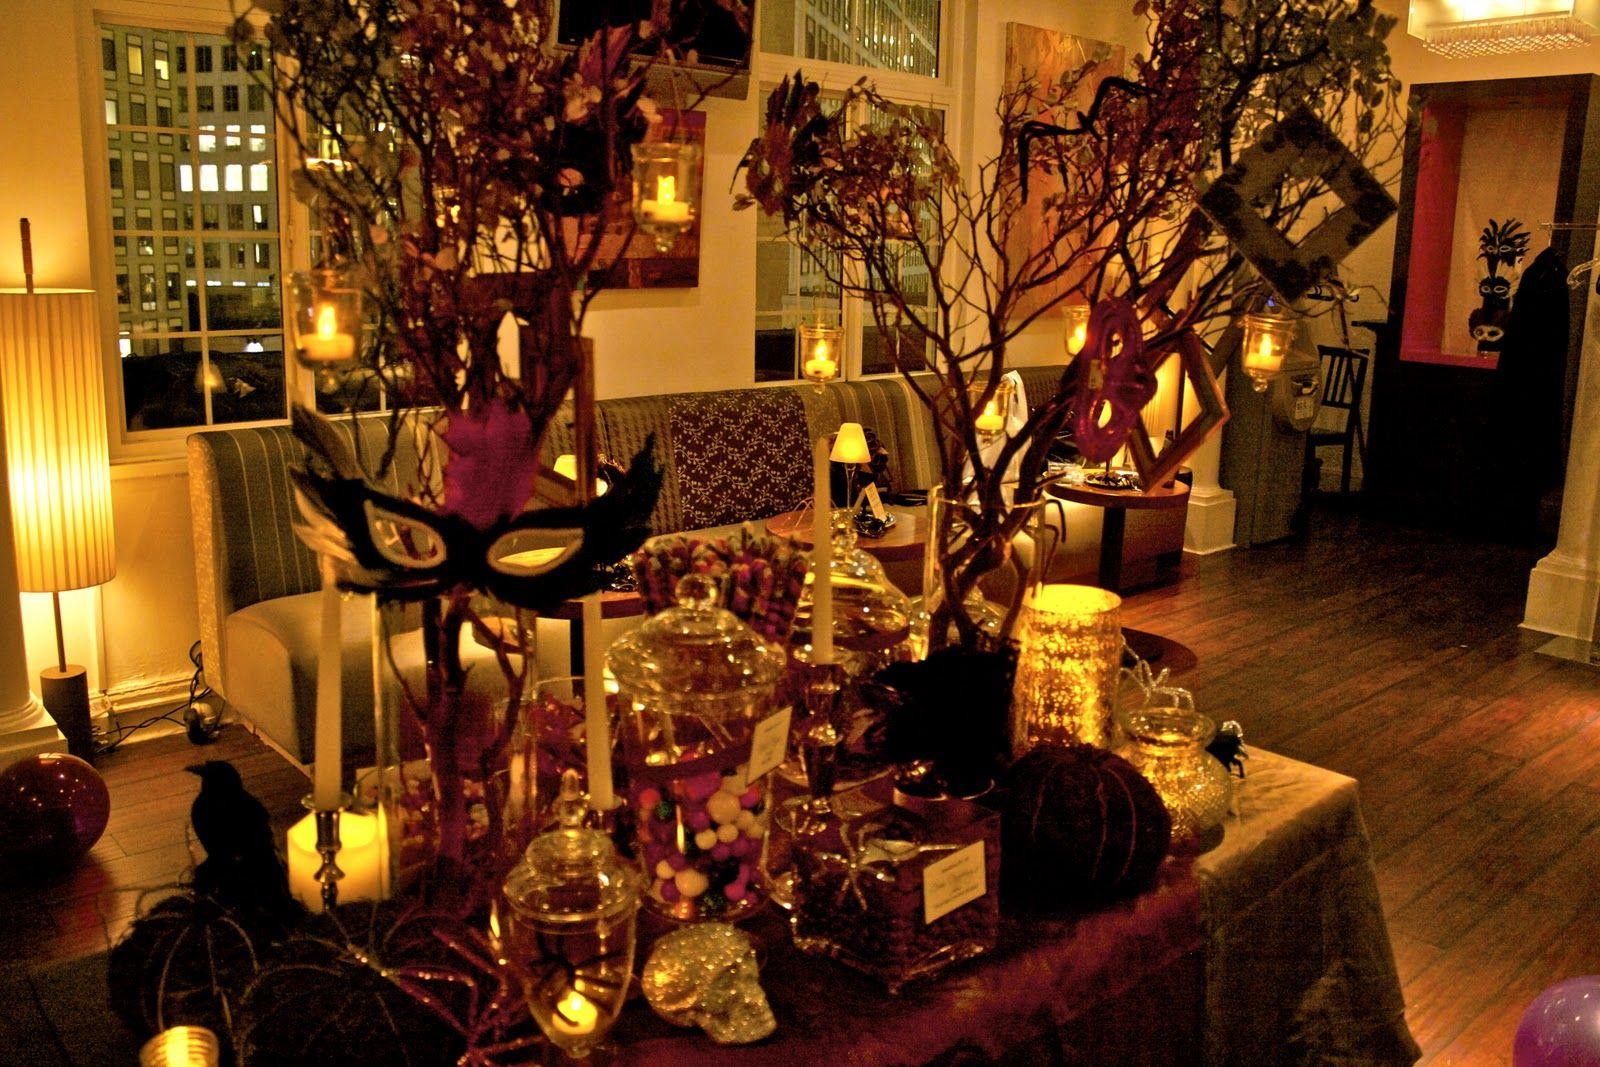 masquerade ball decorations ideas - Masquerade Decorations for the . & masquerade ball decorations ideas - Masquerade Decorations for the ...